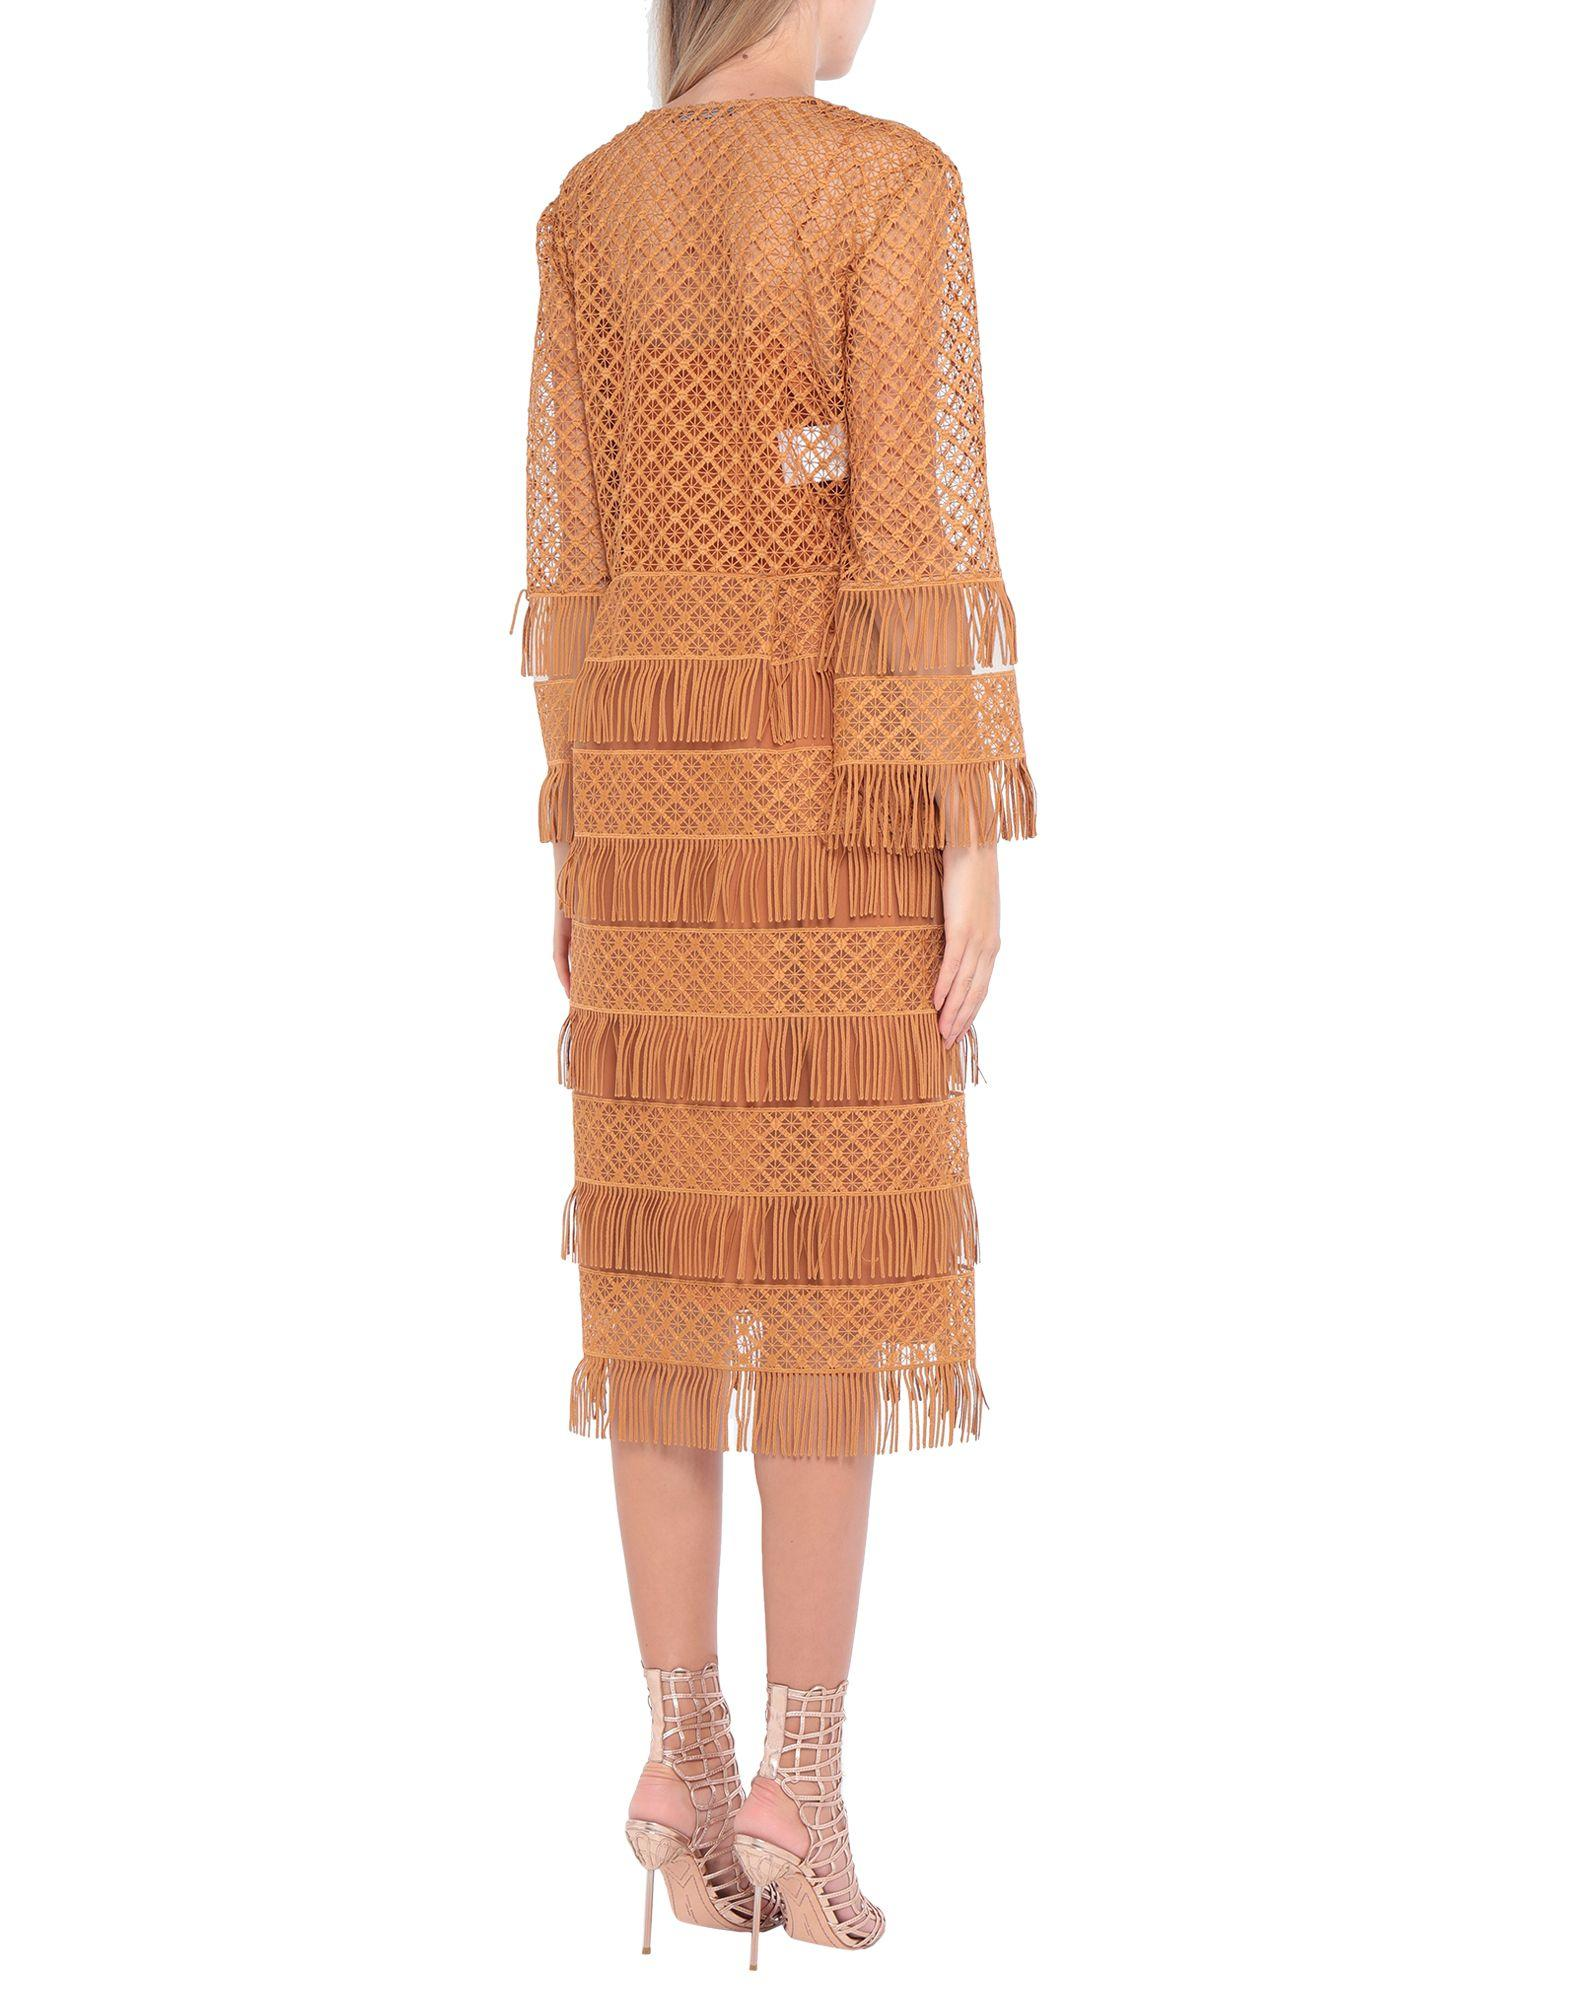 Vestido por la rodilla Alberta Ferretti de Tul de color Marrón